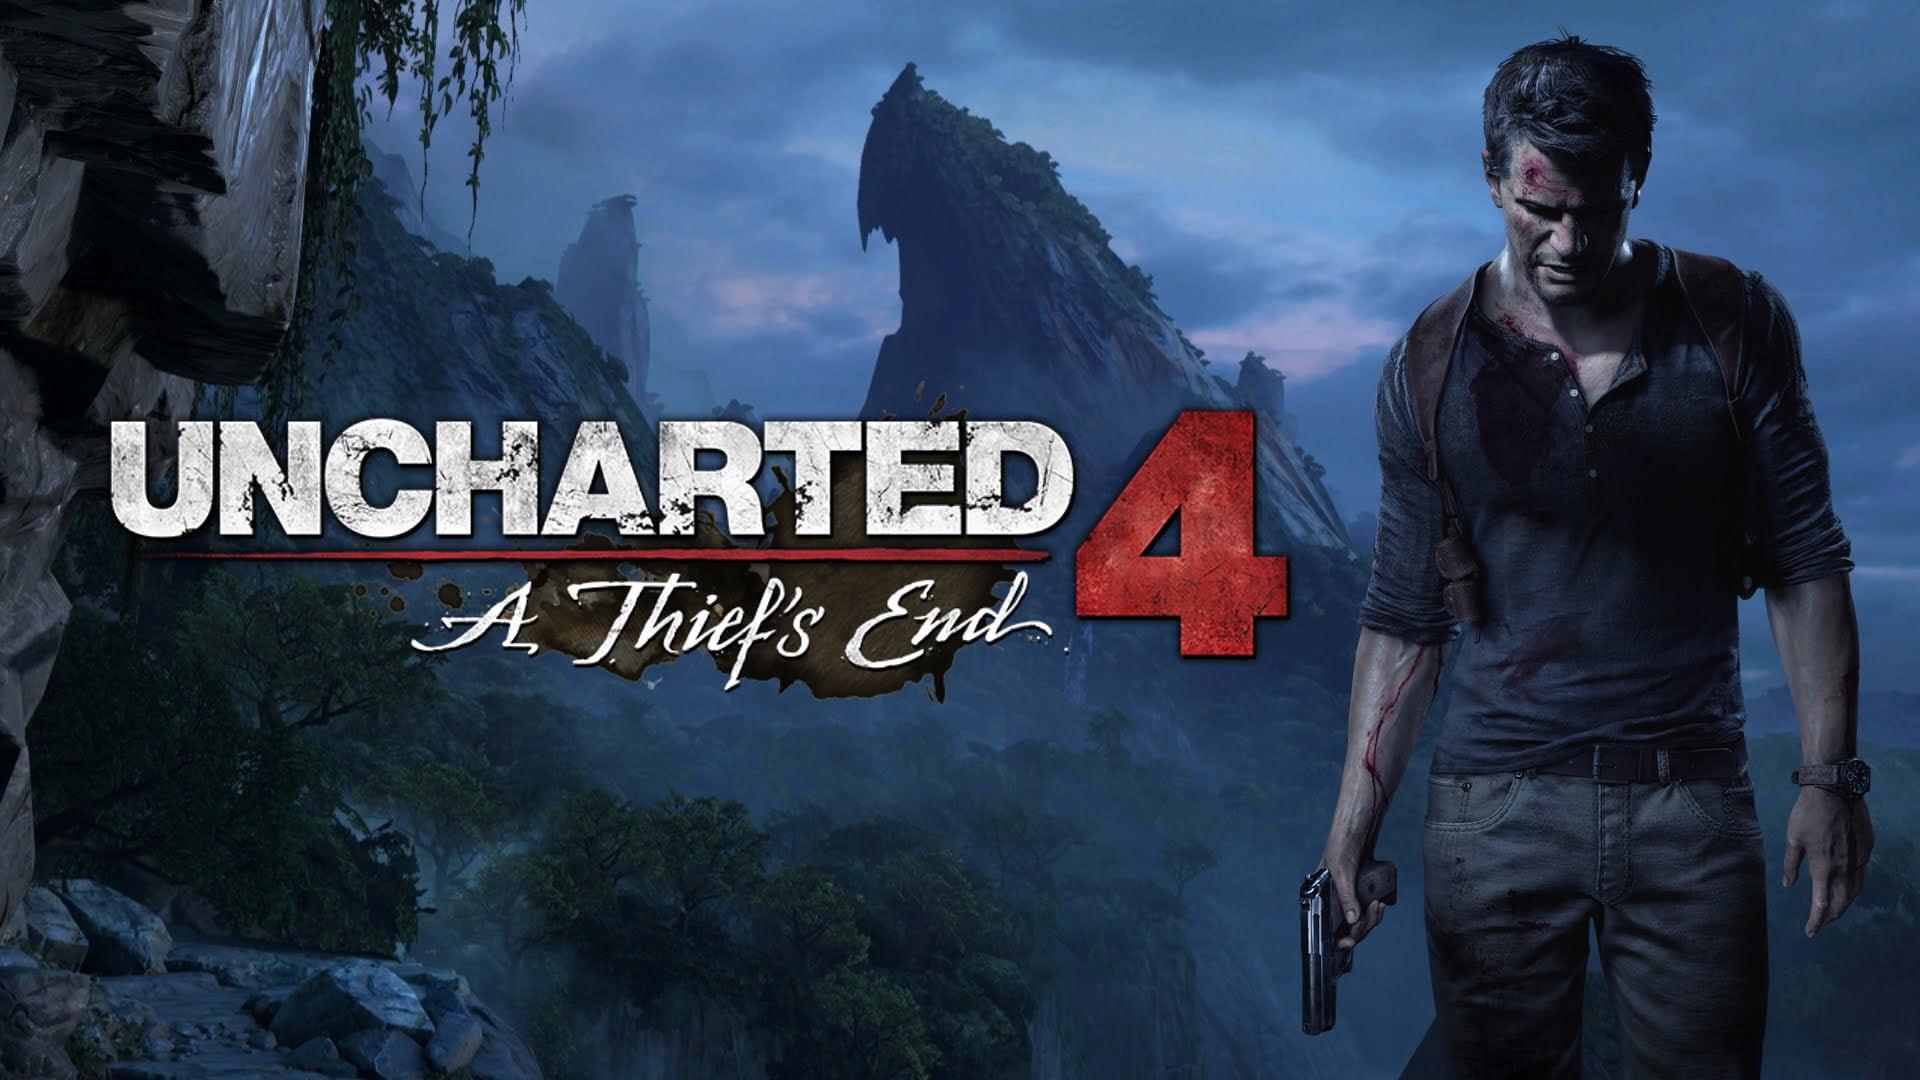 Uncharted 4 Το τέλος ενός κλέφτη: Videogame υπερ-παραγωγή